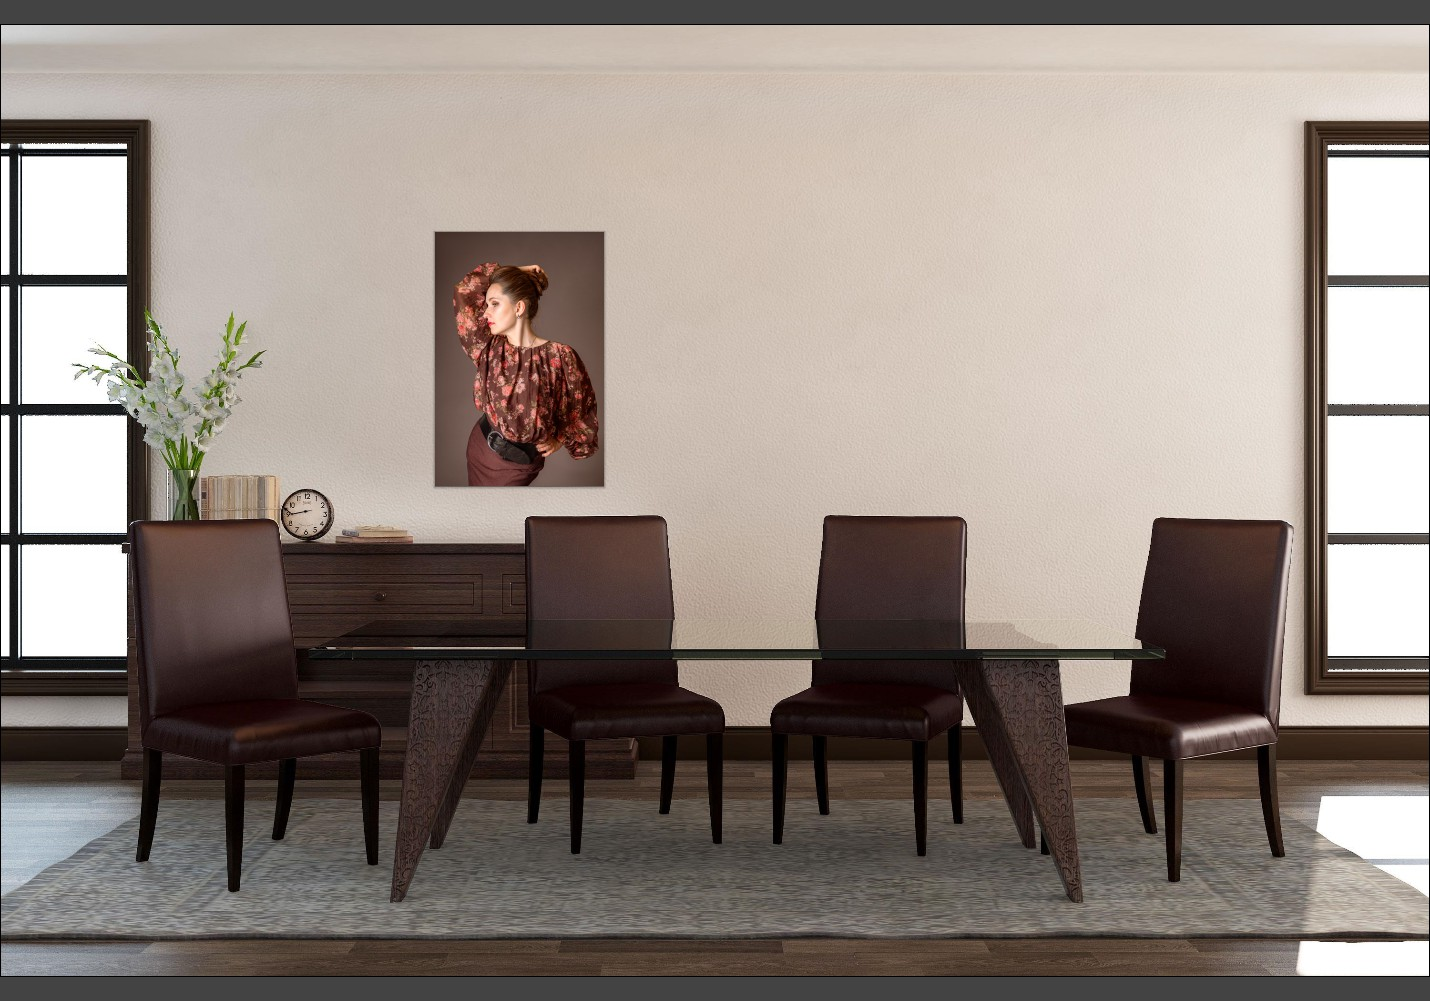 Room view of a fine art portrait